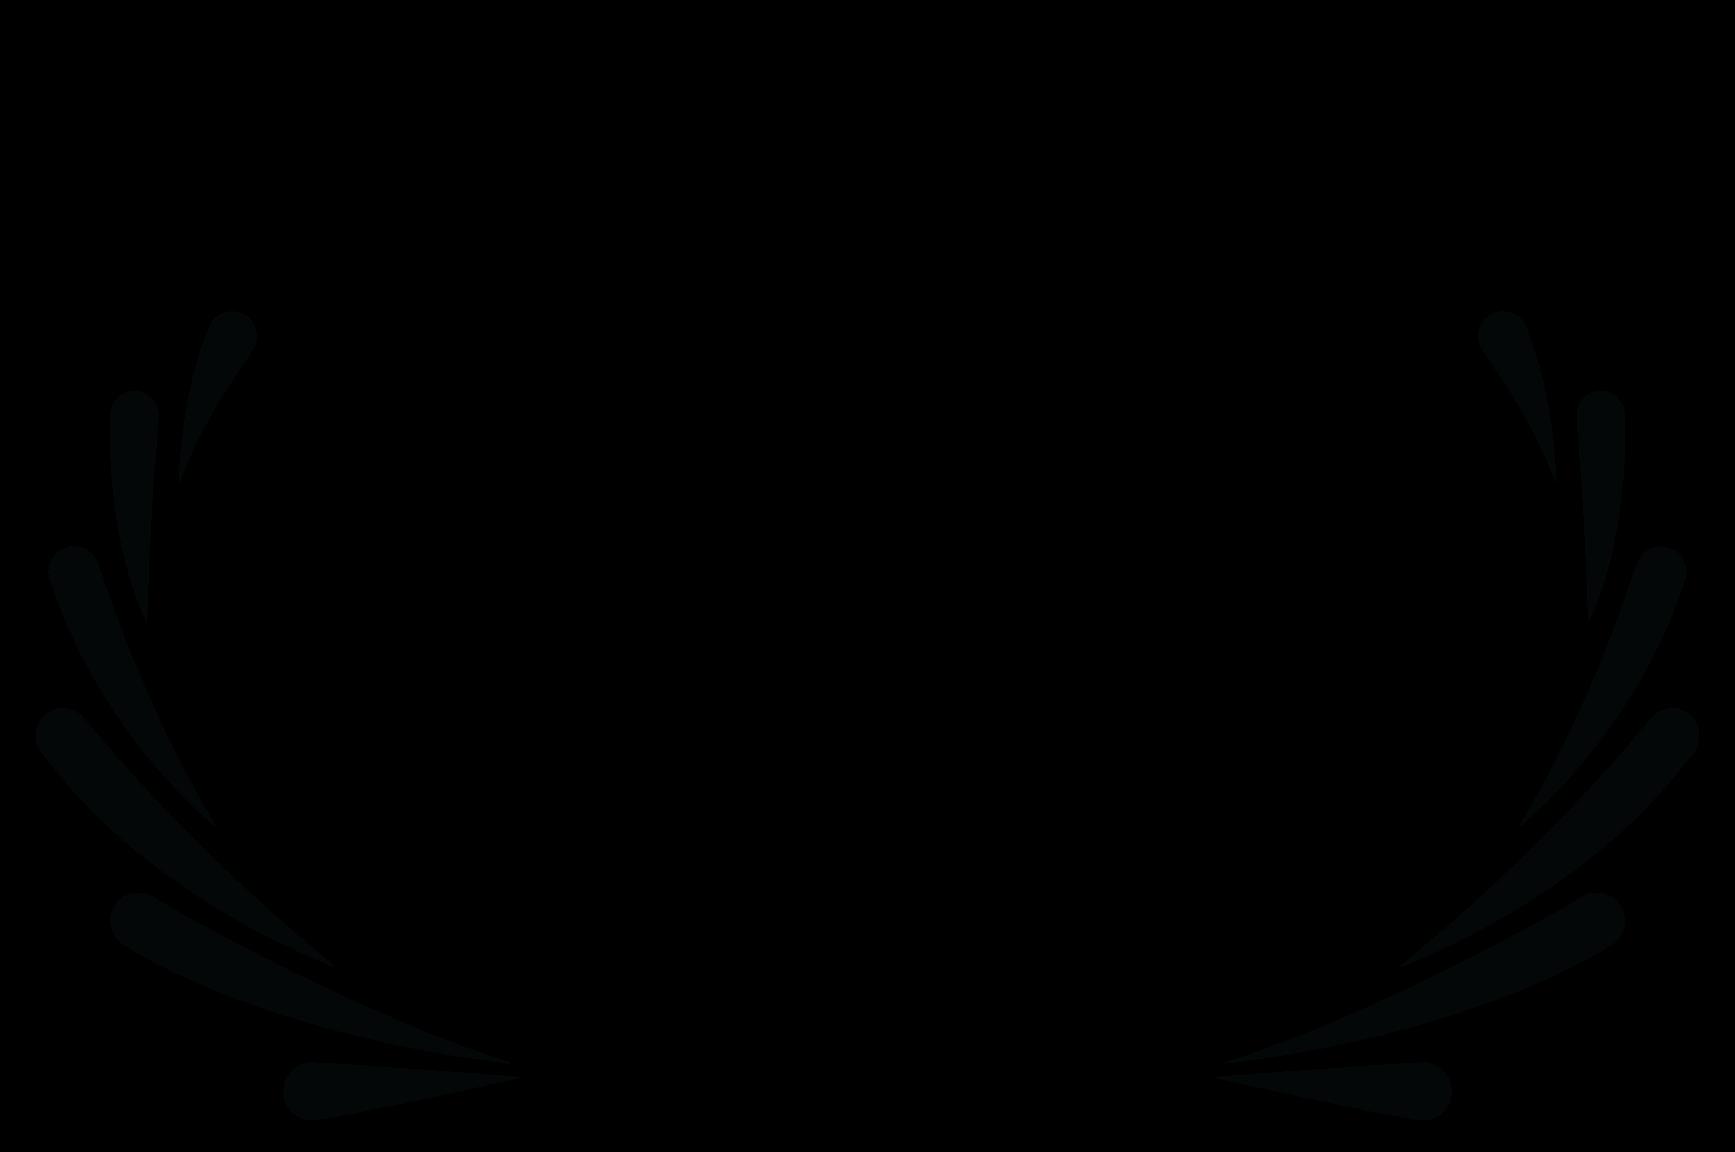 OFFICIAL SELECTION – FESTIVAL INTERNACIONAL DEL CORTOMETRAJE FIC – 2017. Bueno Aires Fever Milo Joki Drector Riberaigua Music video short film png